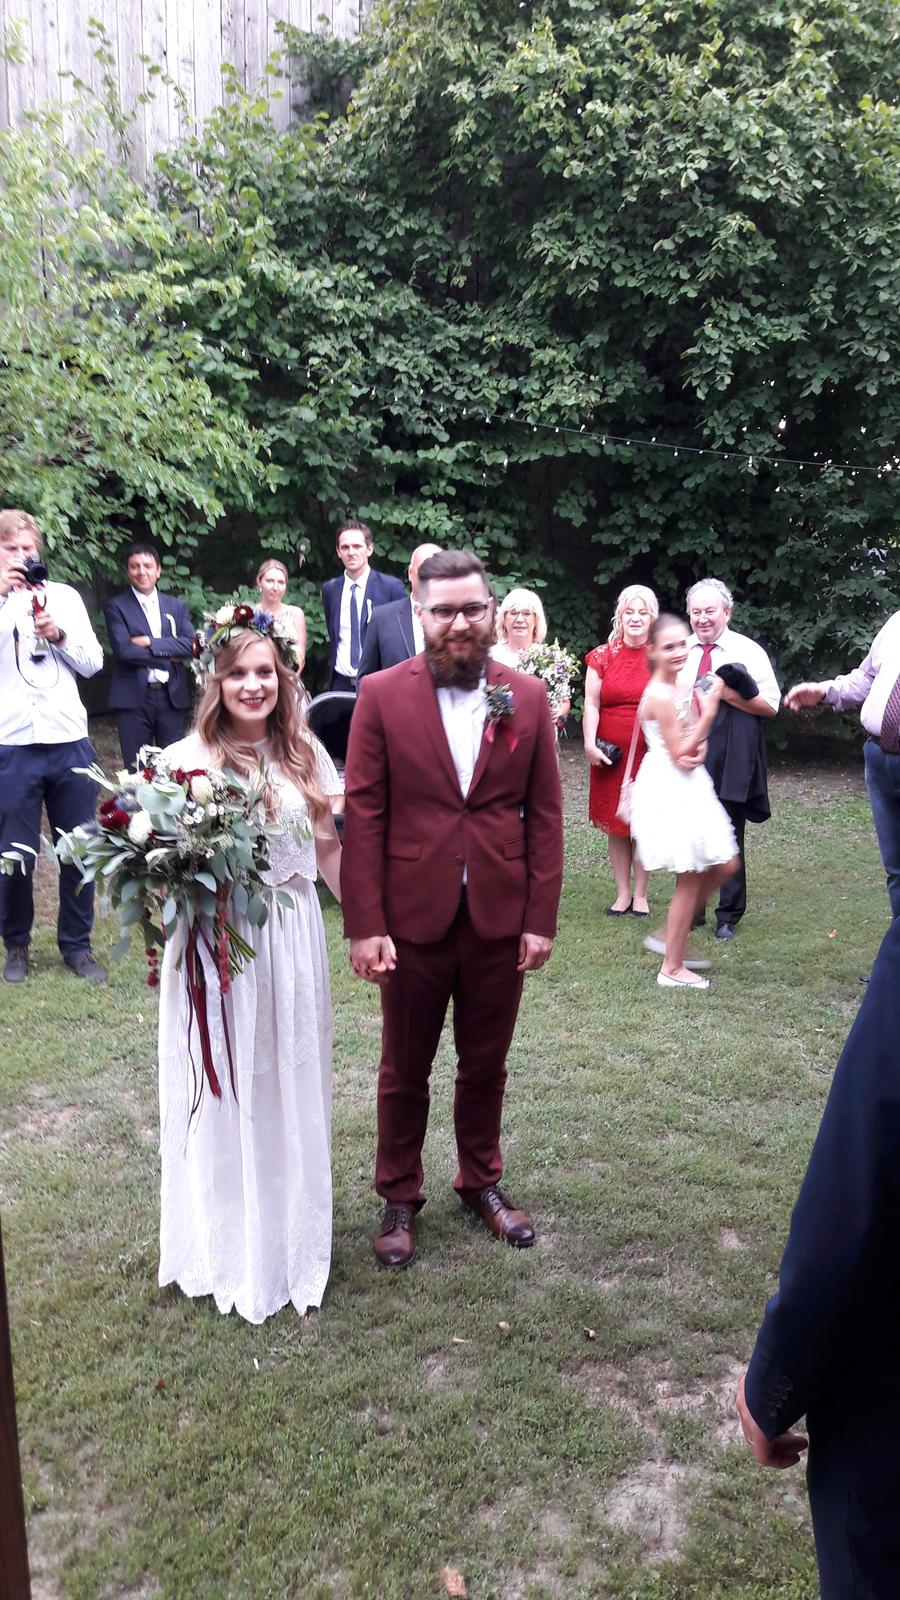 Djka eLLy d - dj eLLy - svadba Zelený deň Bošáca - Silvia a Dávid